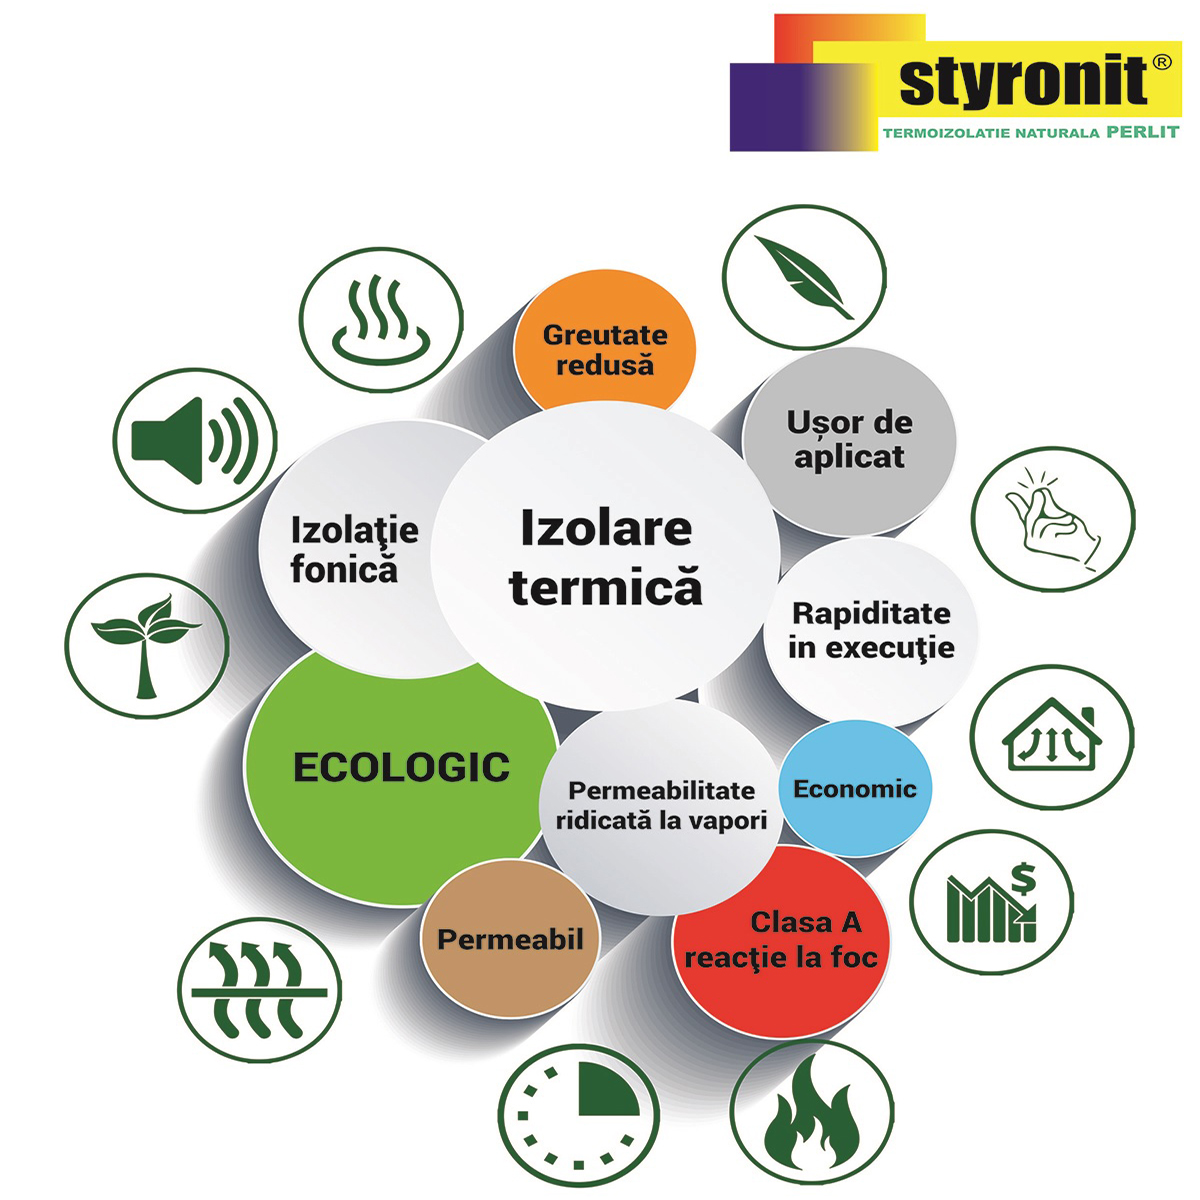 Caracteristici Styronit - Caracteristici Styronit